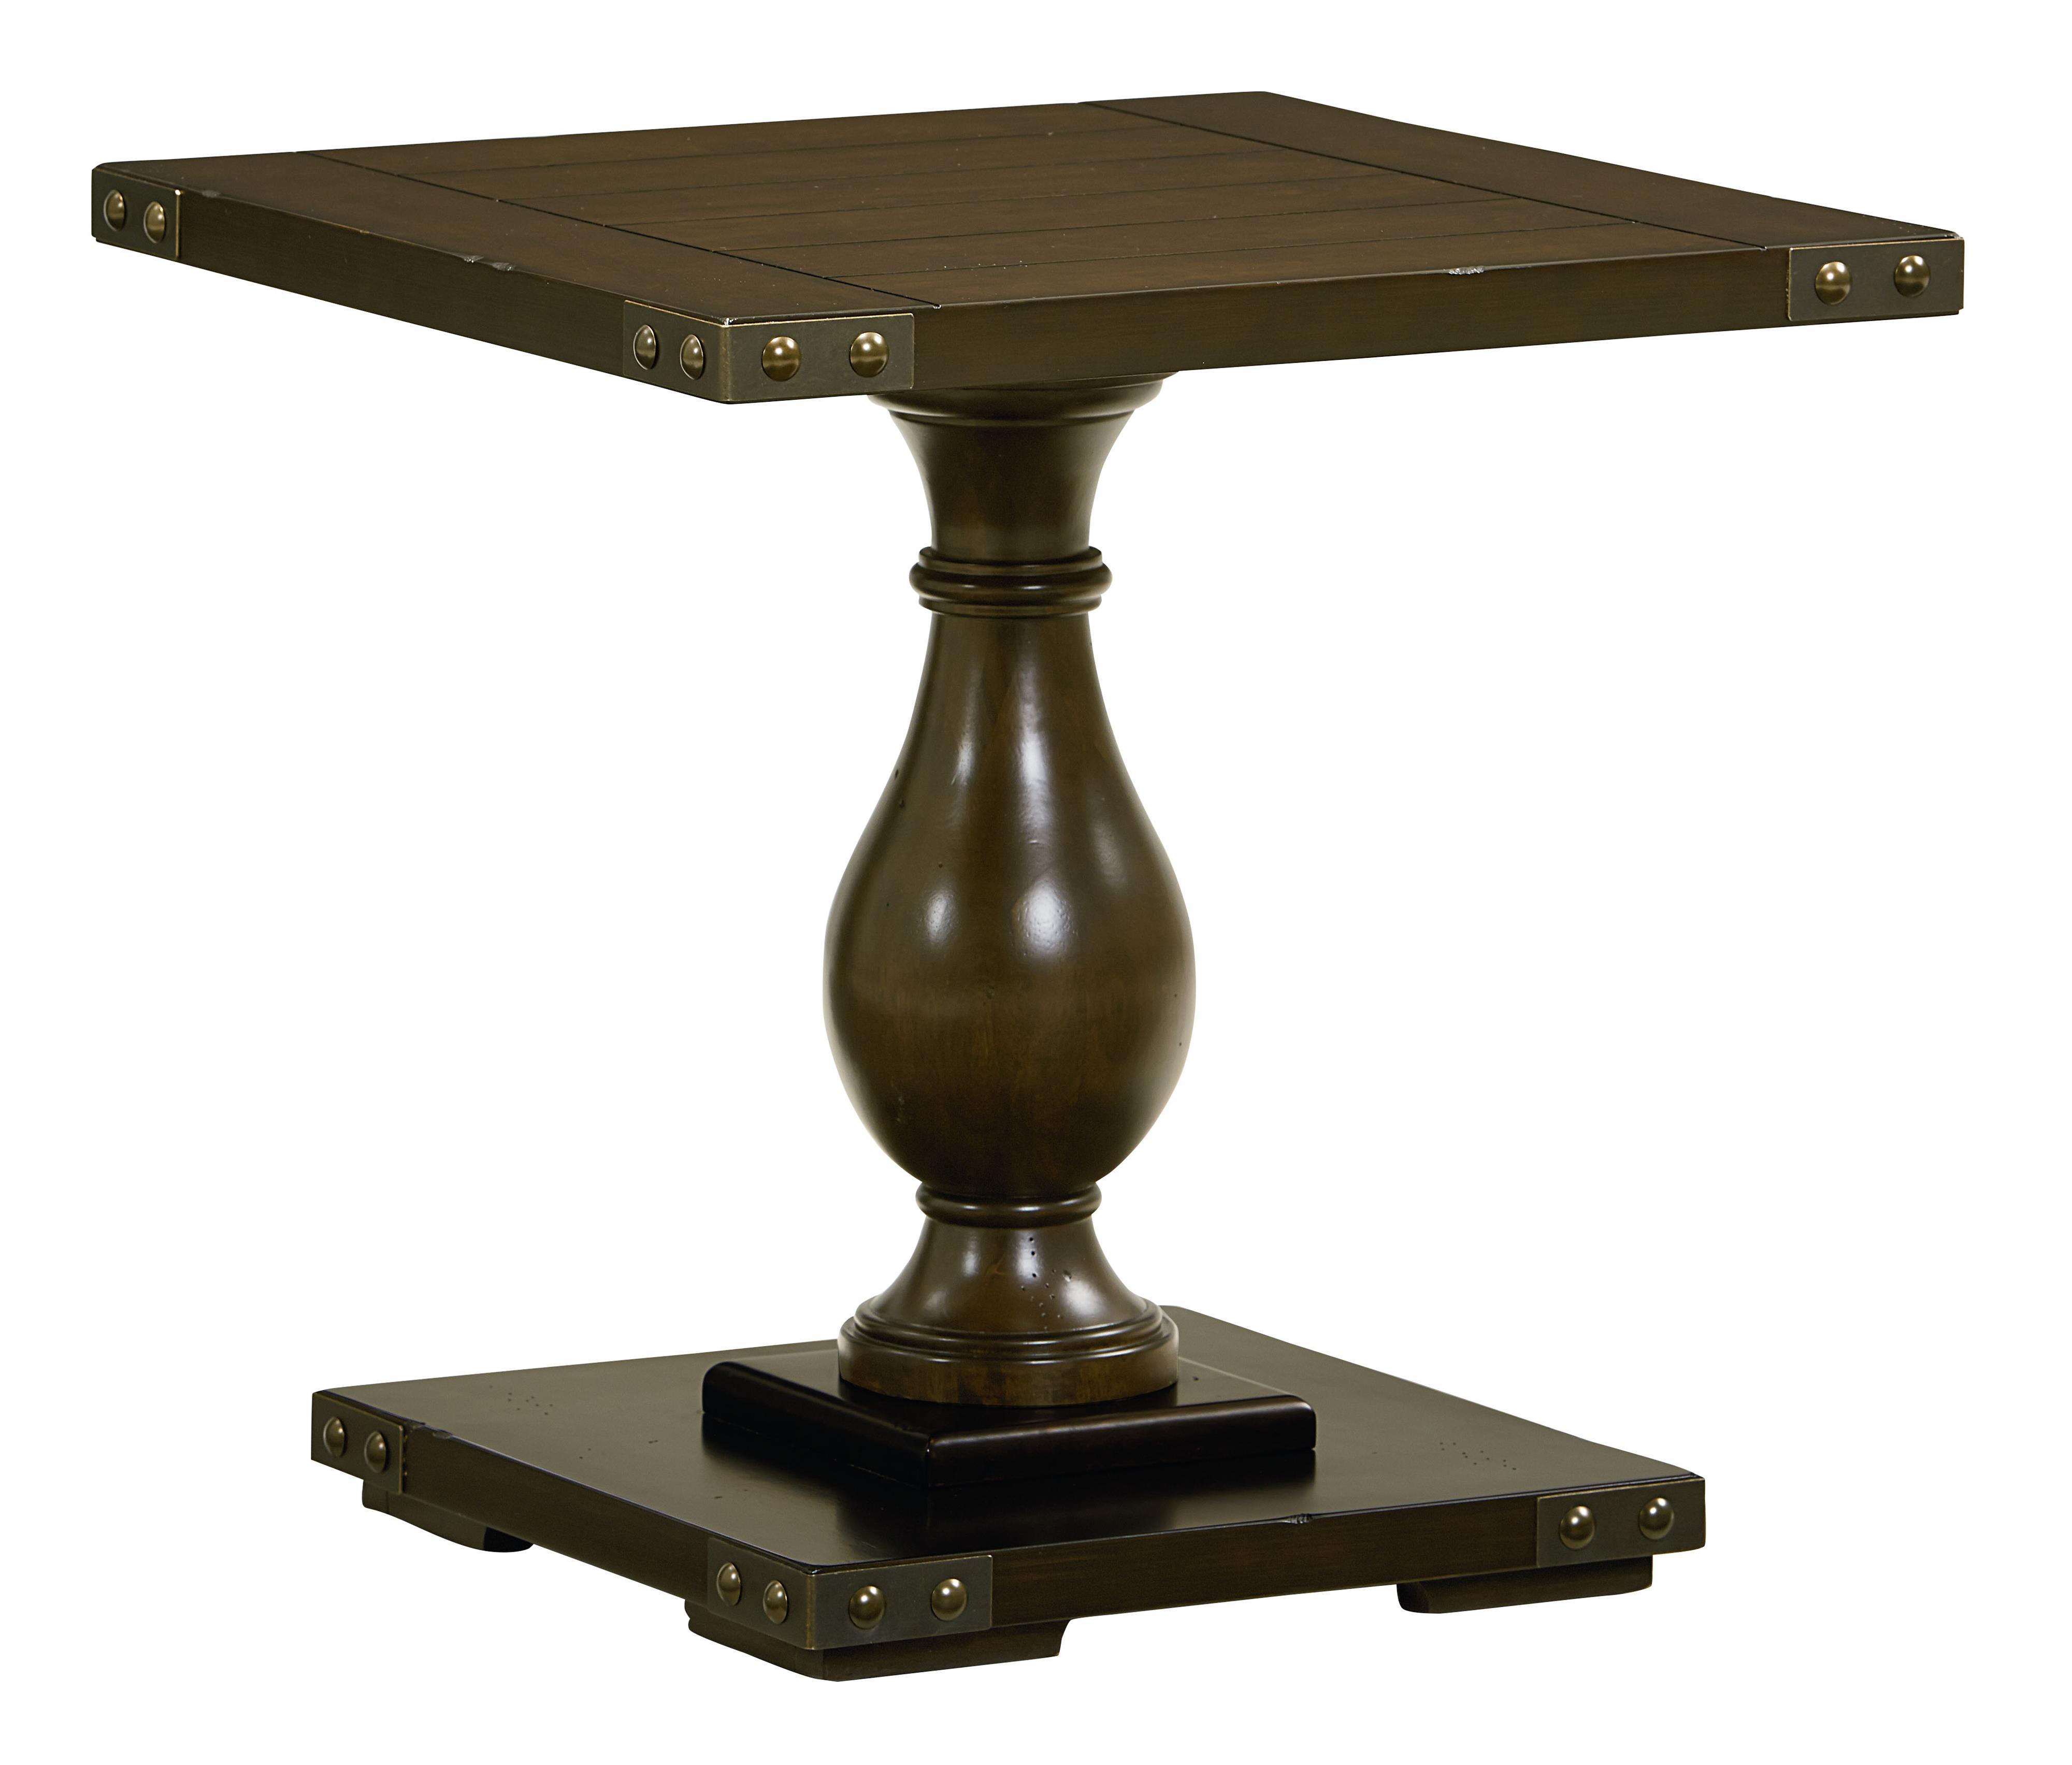 Standard Furniture Pierwood End Table - Item Number: 29252